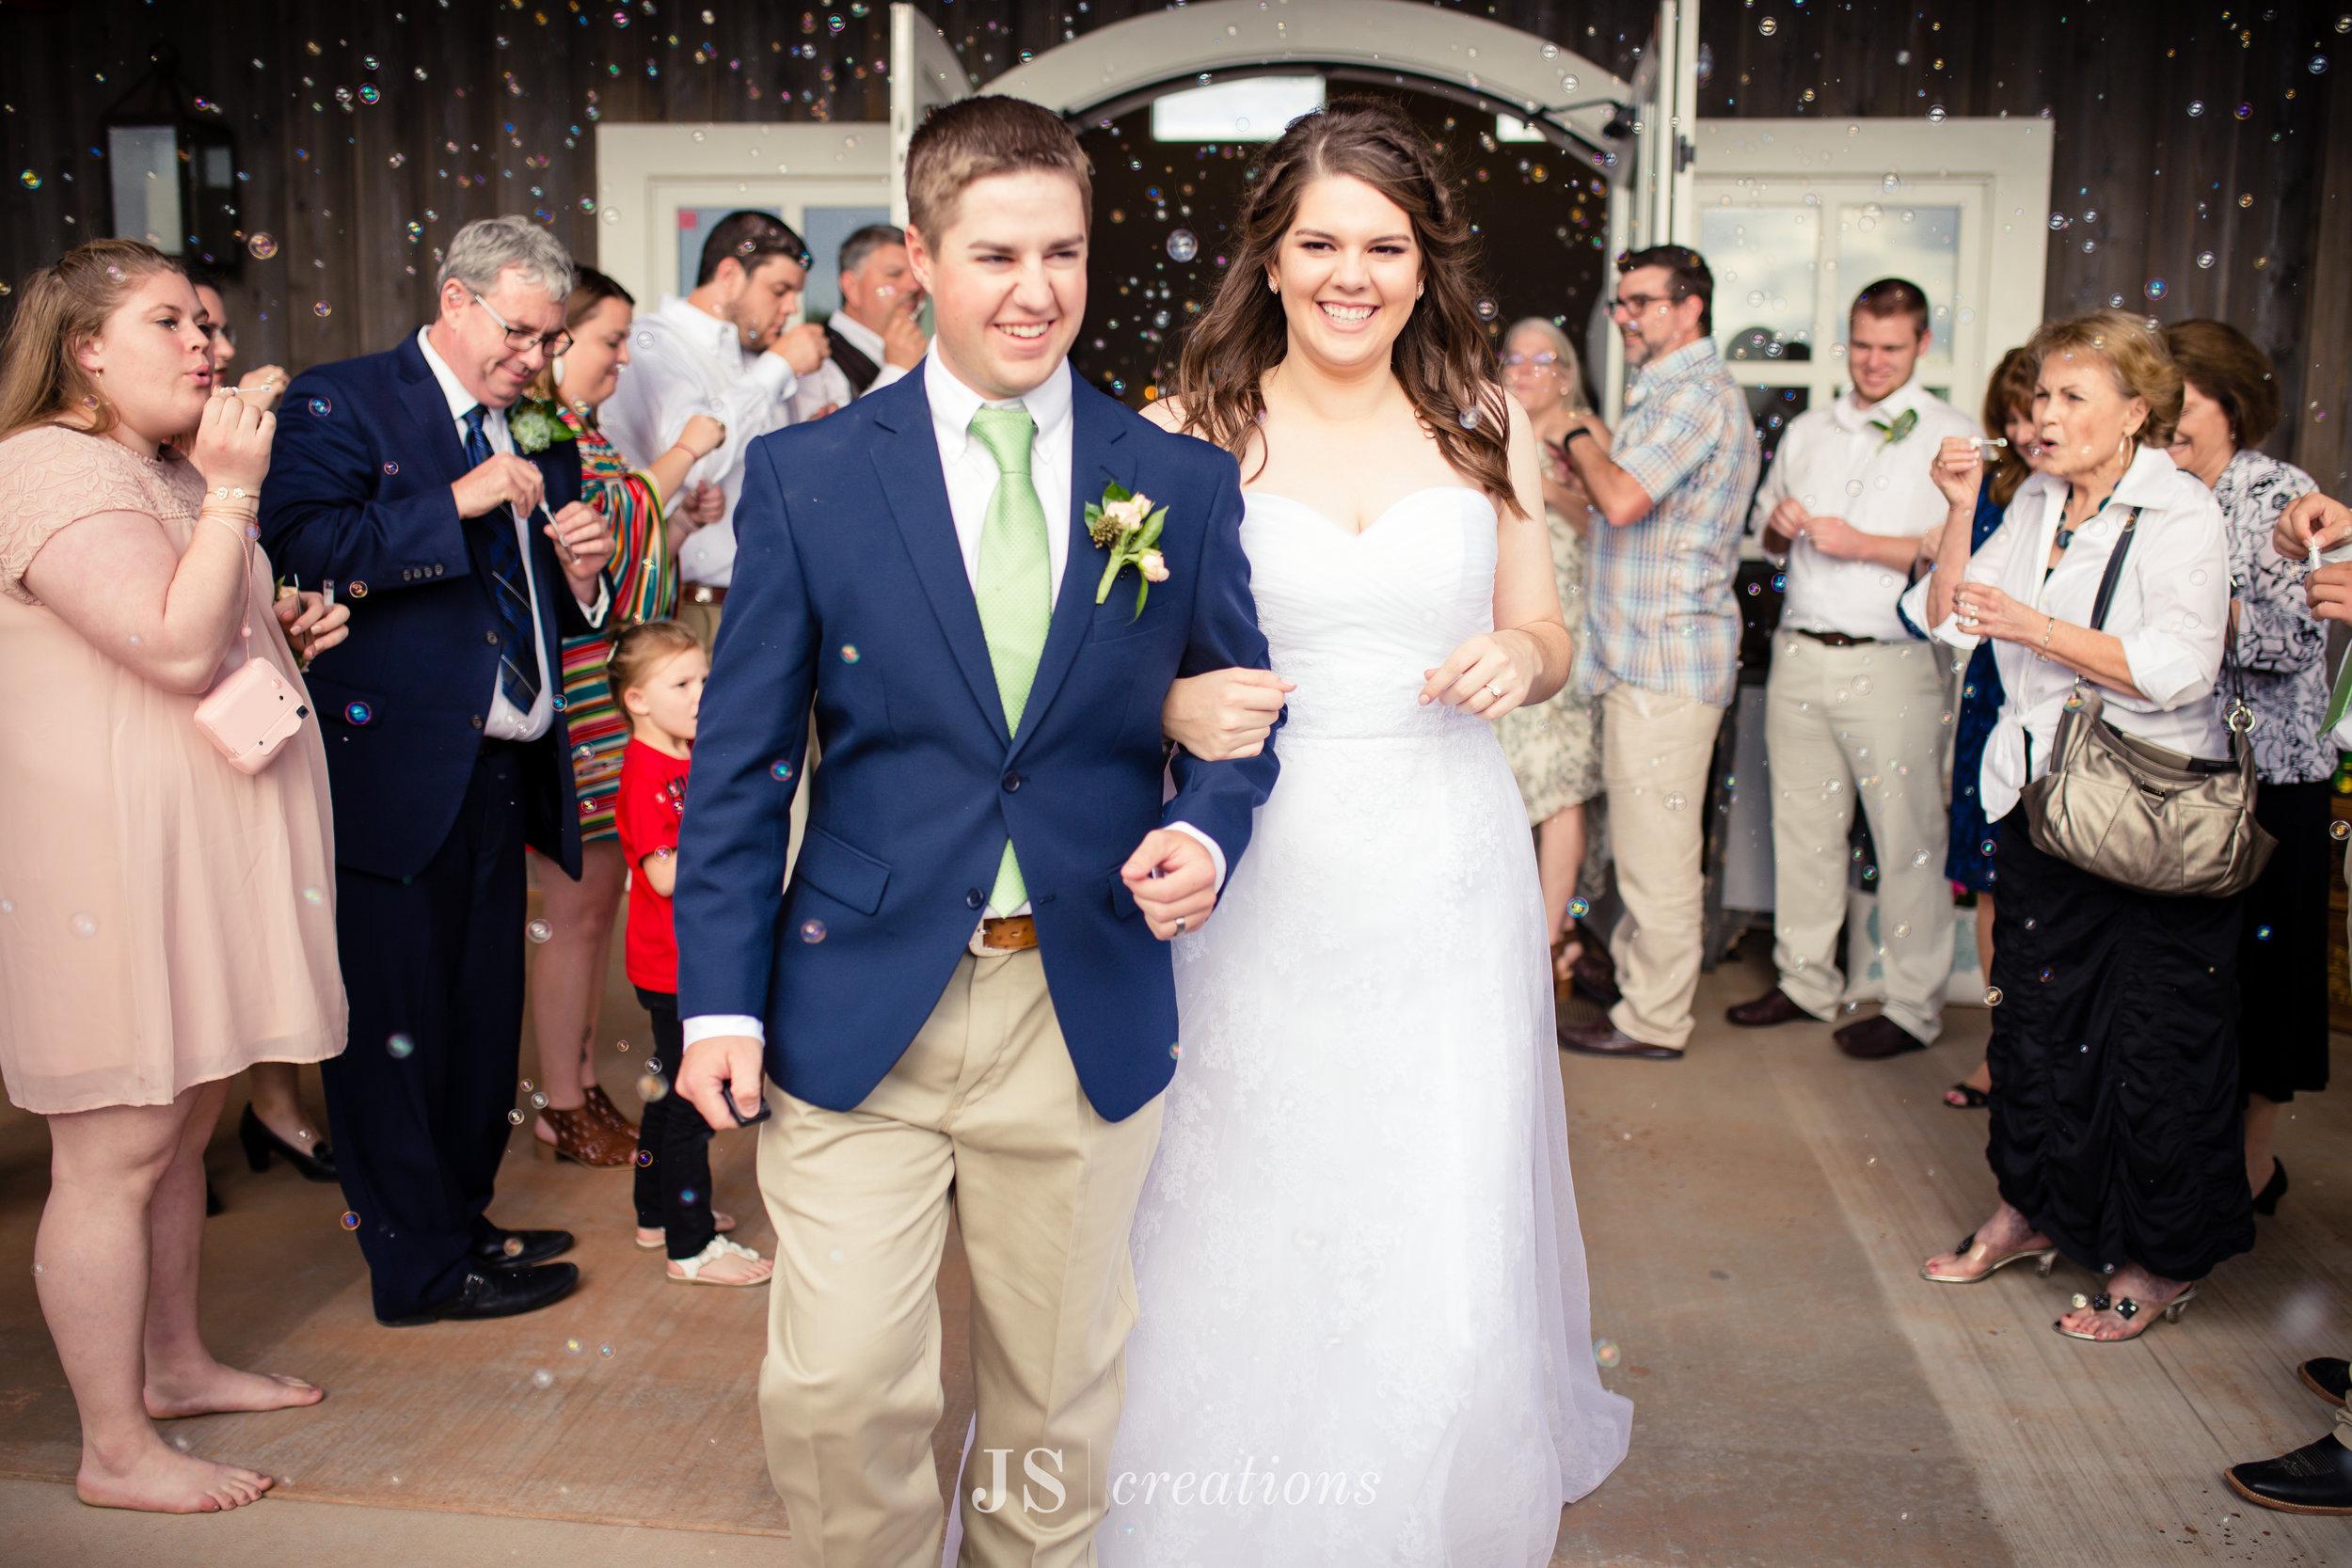 JSCreations_Weddings-628.jpg